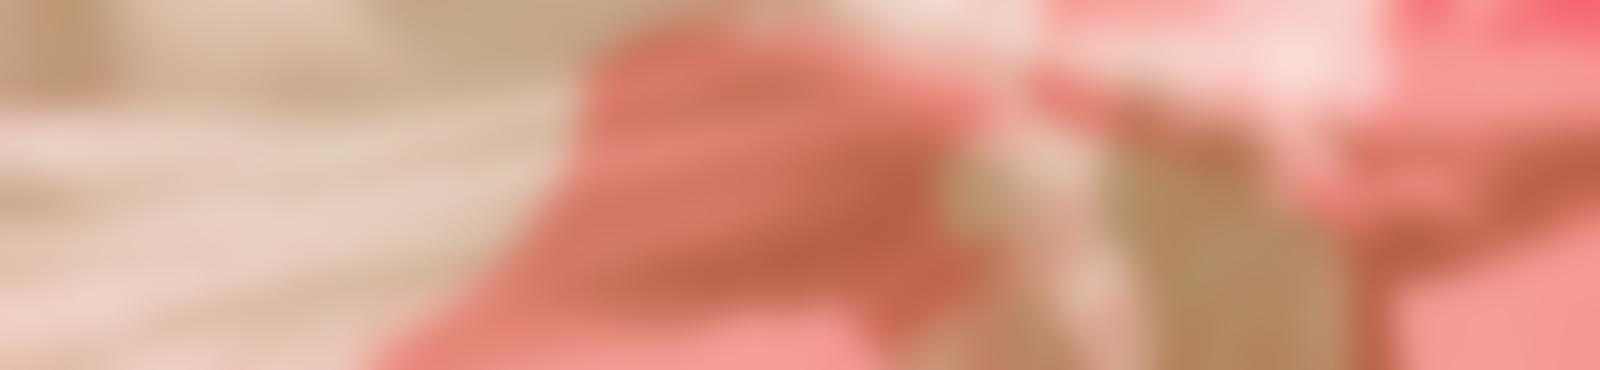 Blurred 5f66d508 57a6 48ec 8467 f00c0ad4aff3